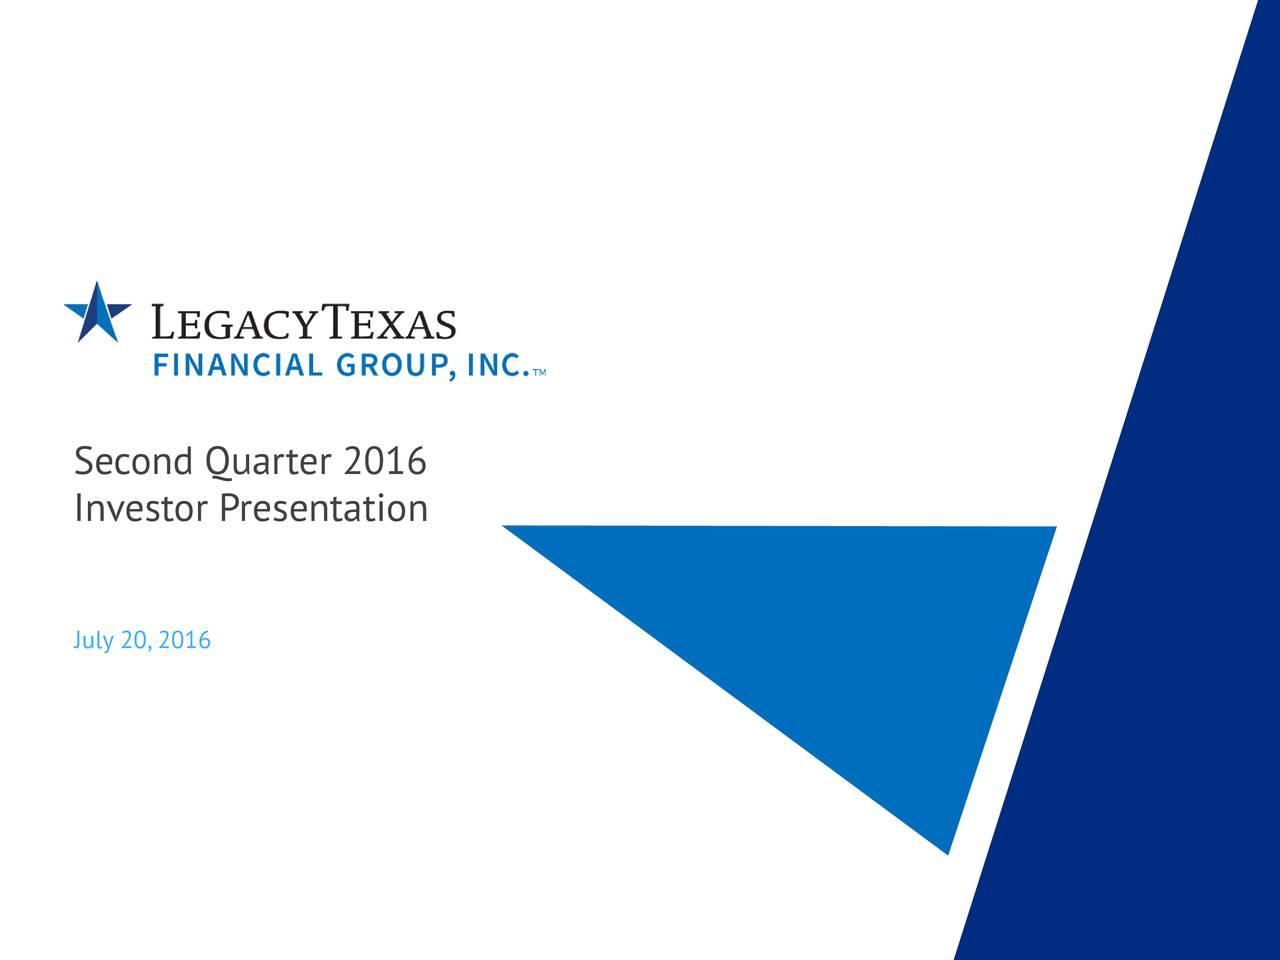 Investor Presentation July 20,2016